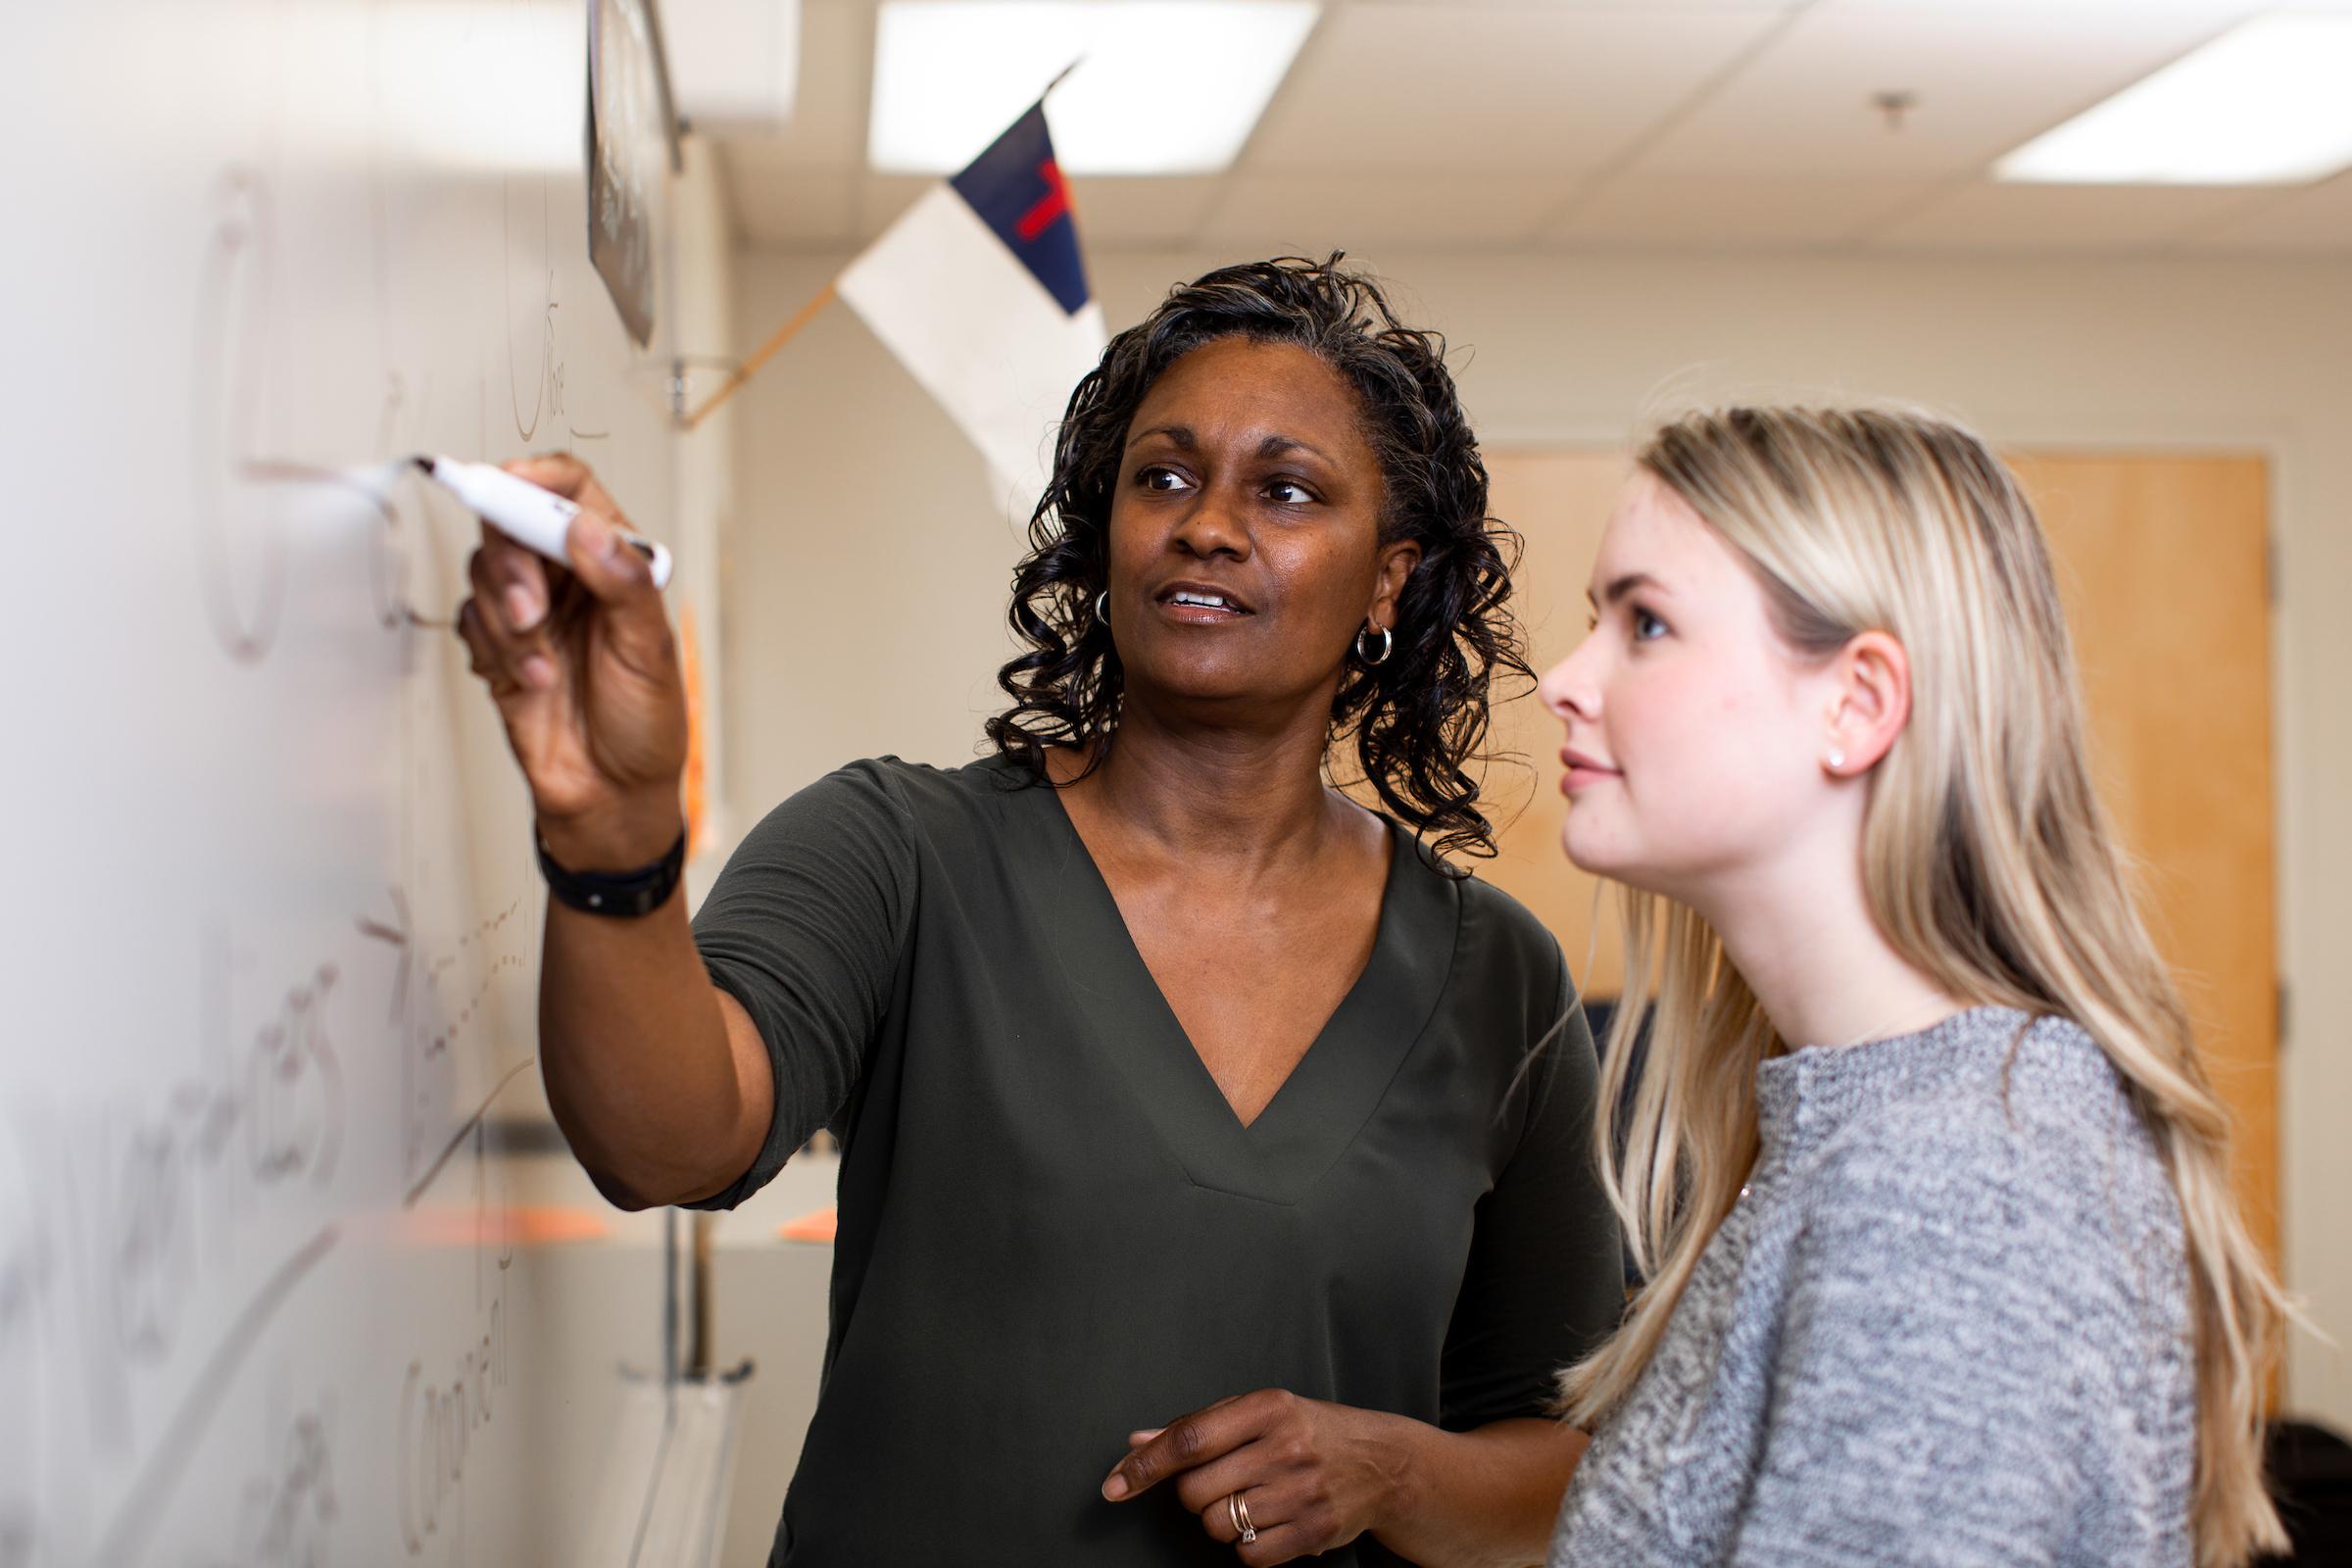 Bachelors Degree In Teaching Mathematics 6 12 Grades